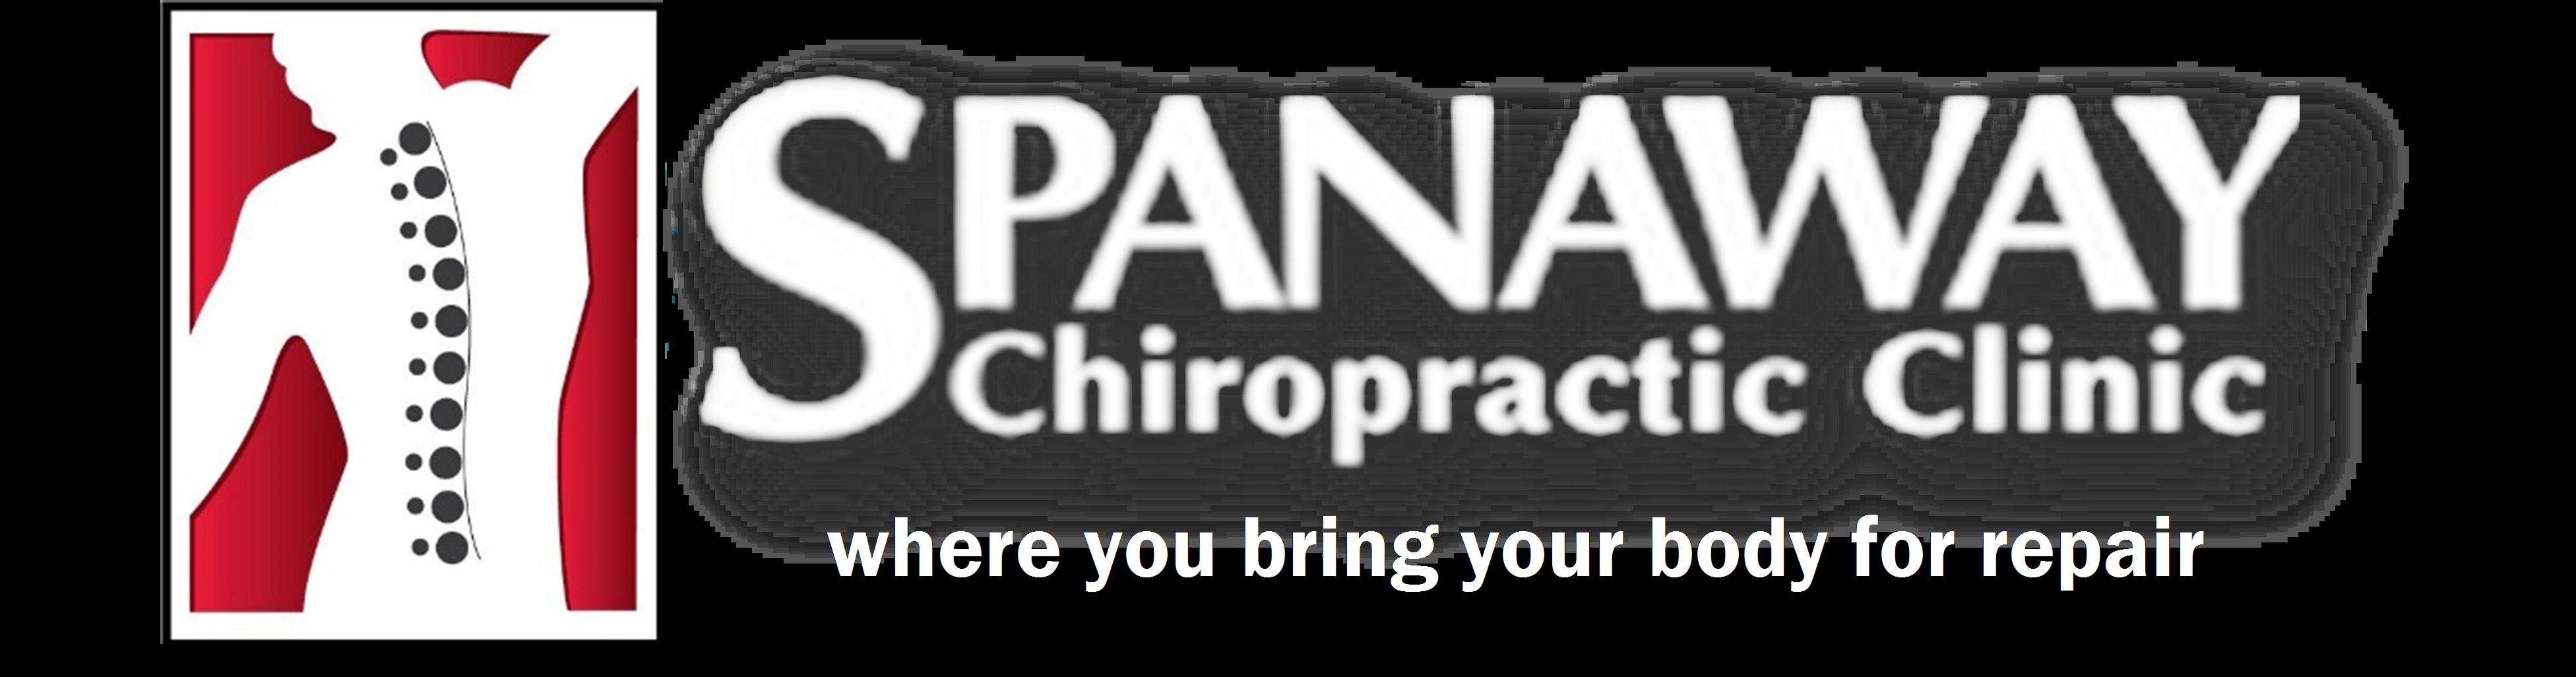 Spanaway Chiropractic Clinic - Chiropractor in Spanaway, WA